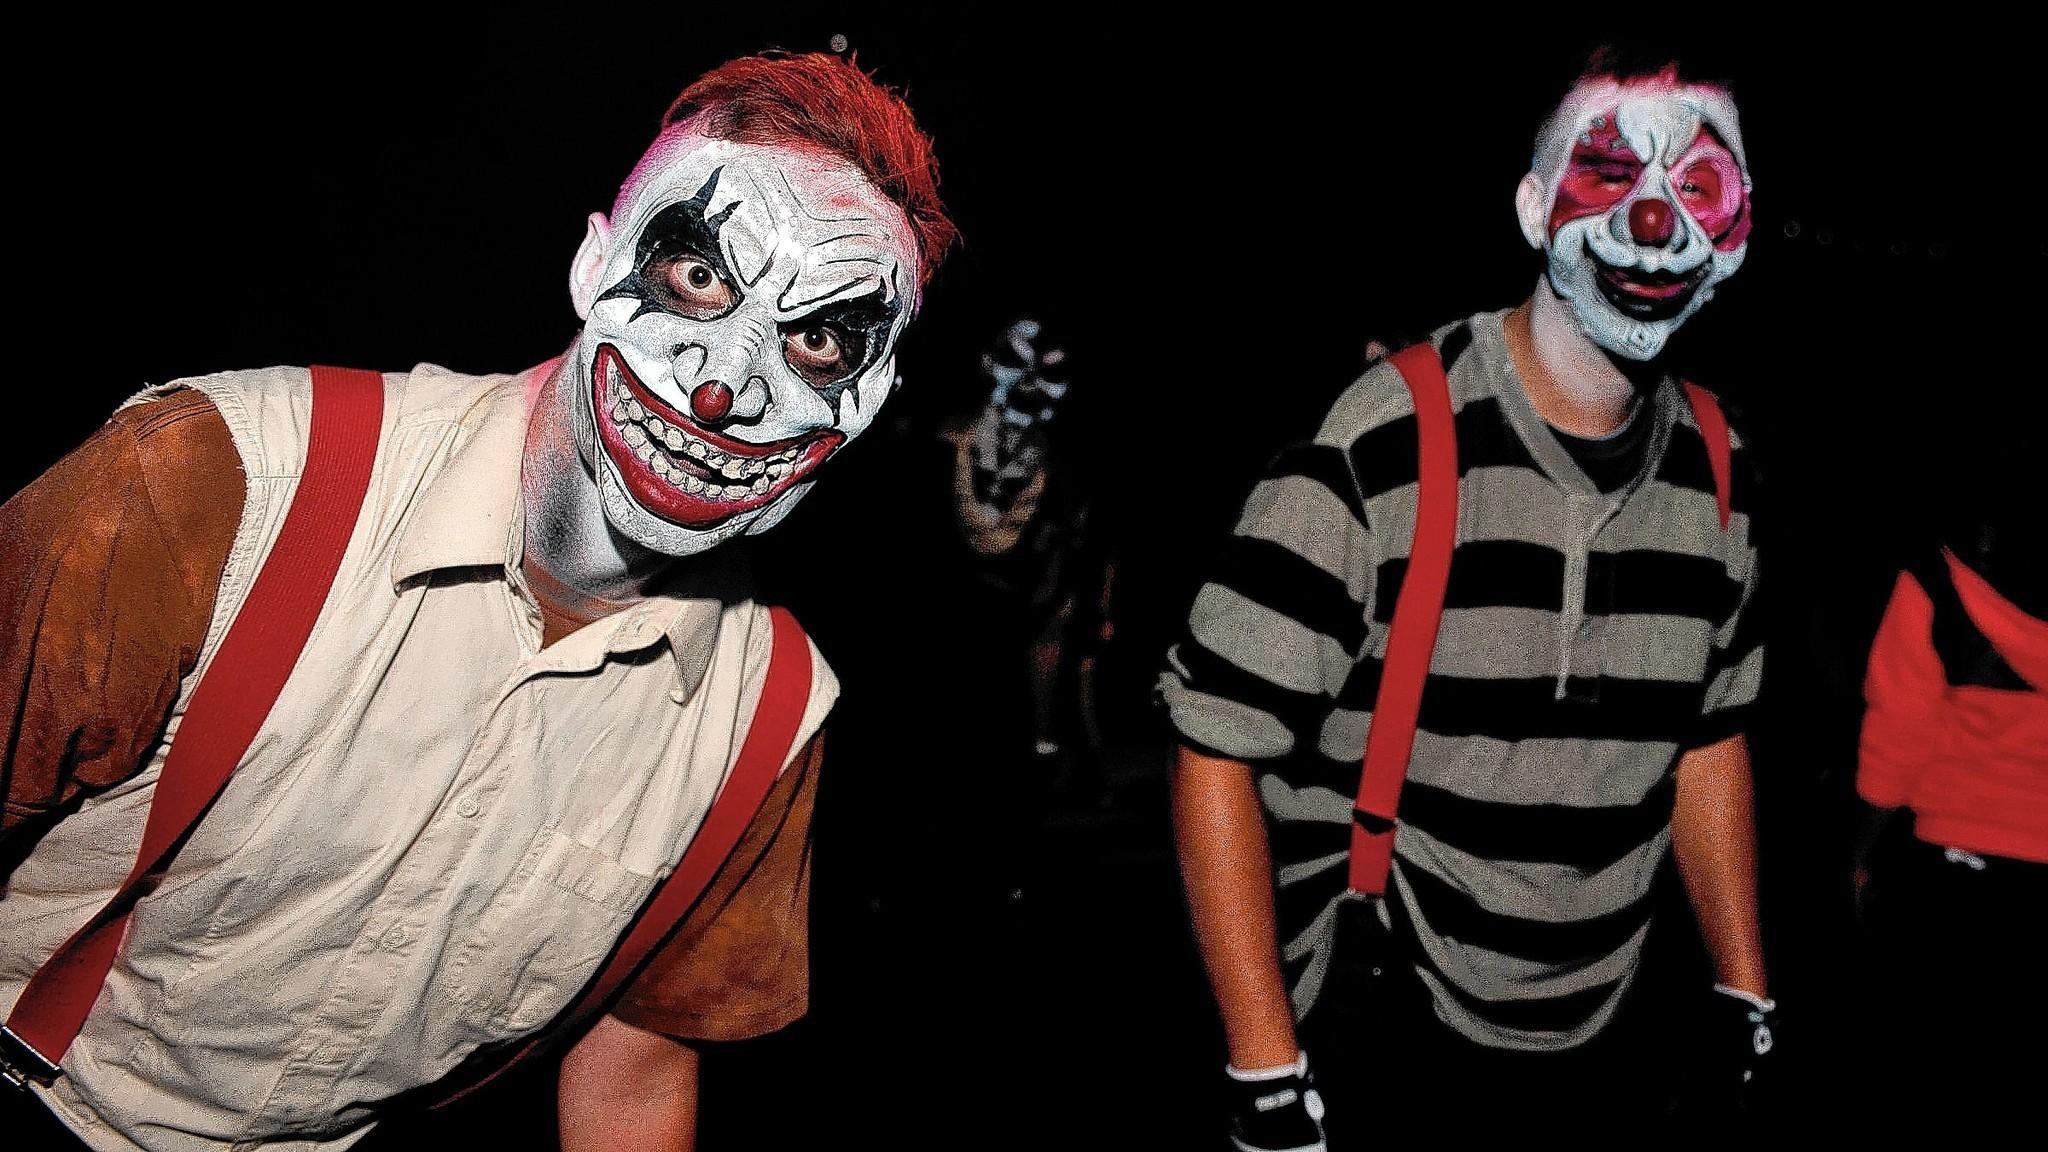 dorney parks halloween haunt offers extreme screams the morning call - Halloween Haunt Schedule